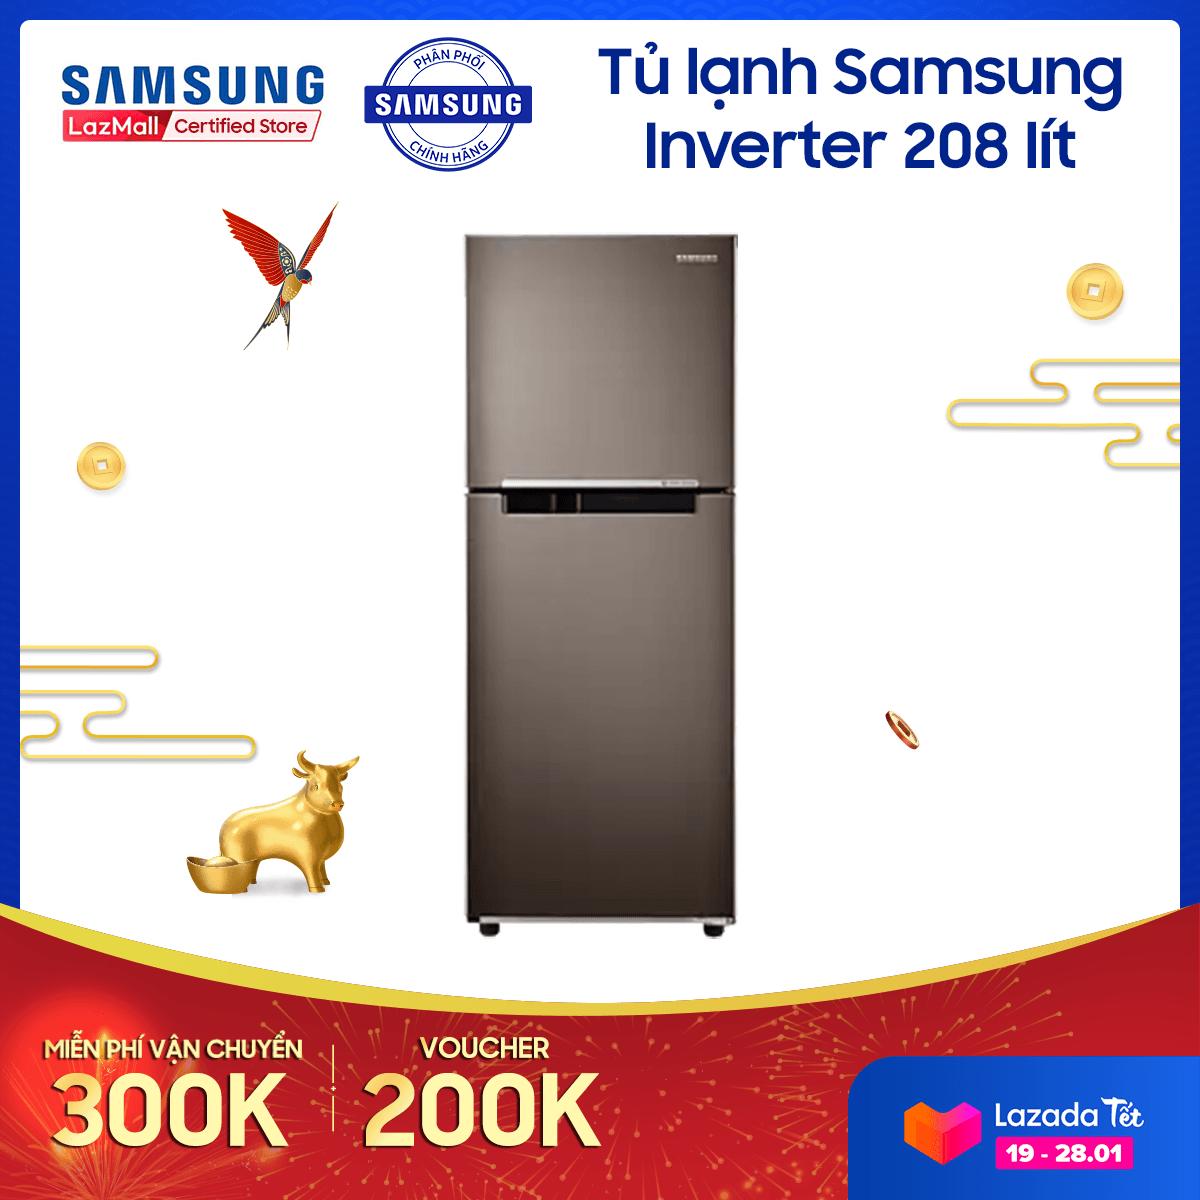 Tủ lạnh Samsung Inverter 208 lít RT20HAR8DDX/SV – REF